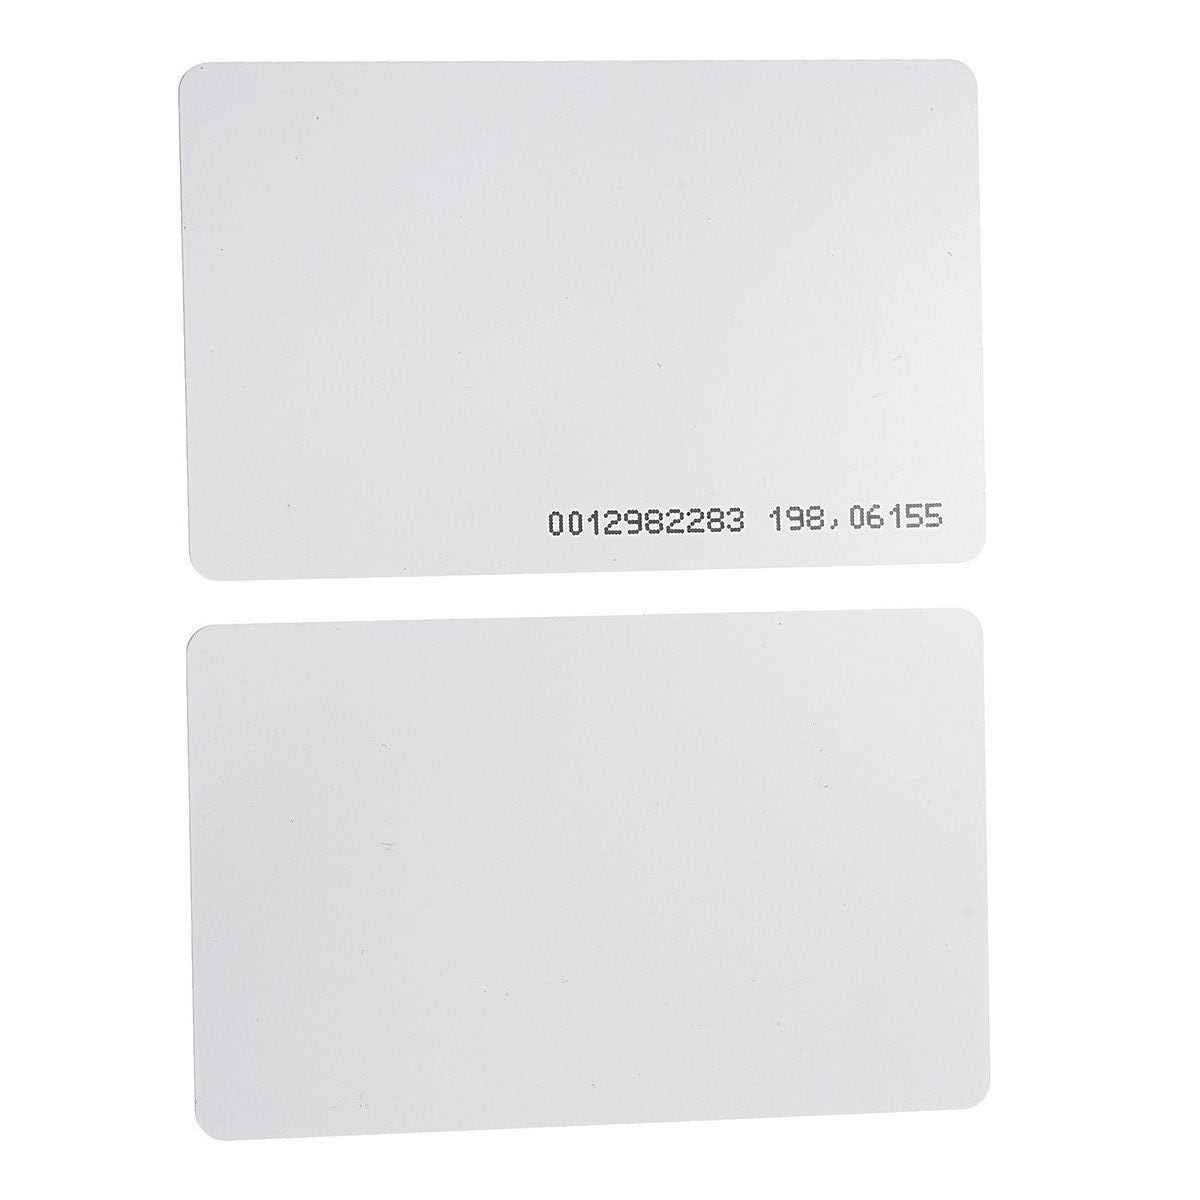 Cartão RFID 125 KHz PVC - 10 unidades